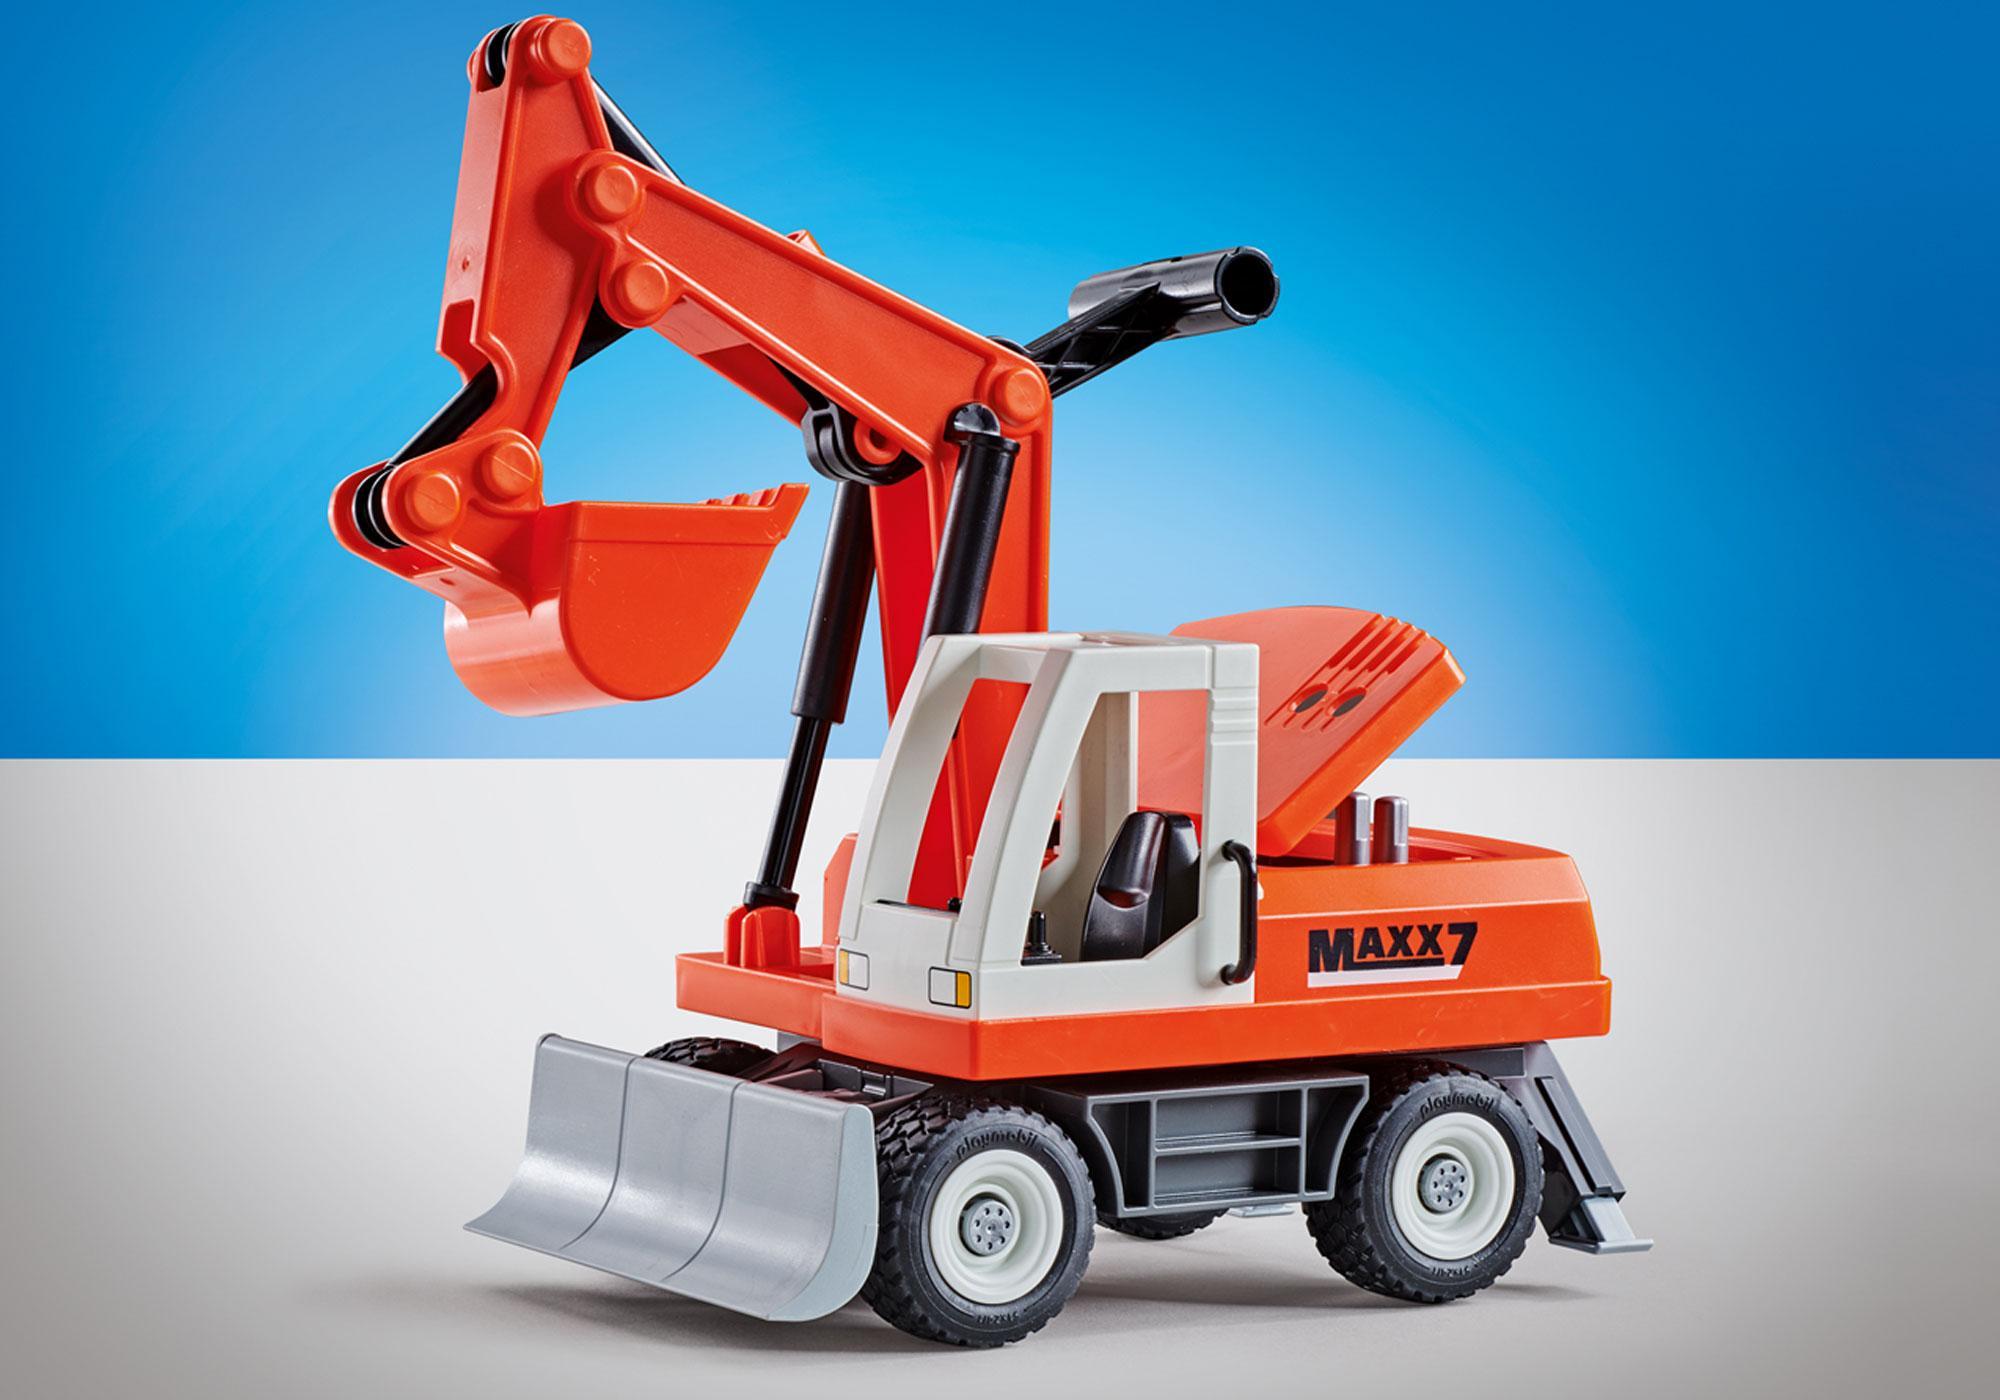 http://media.playmobil.com/i/playmobil/9800_product_detail/Escavatore con braccio